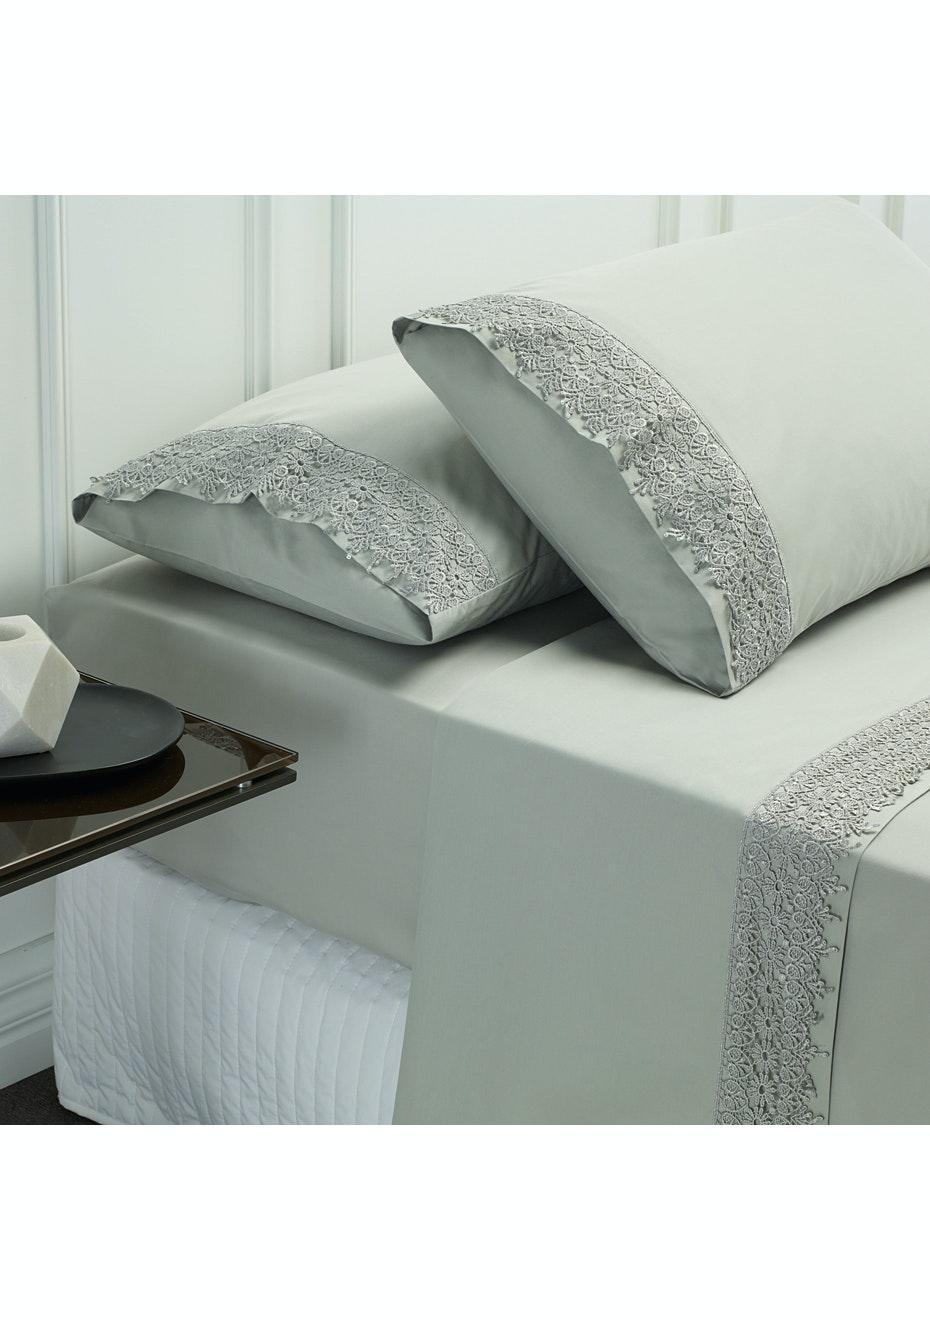 Style & Co 1000 Thread count Egyptian Cotton Hotel Collection Valencia Sheet sets Mega King Silver